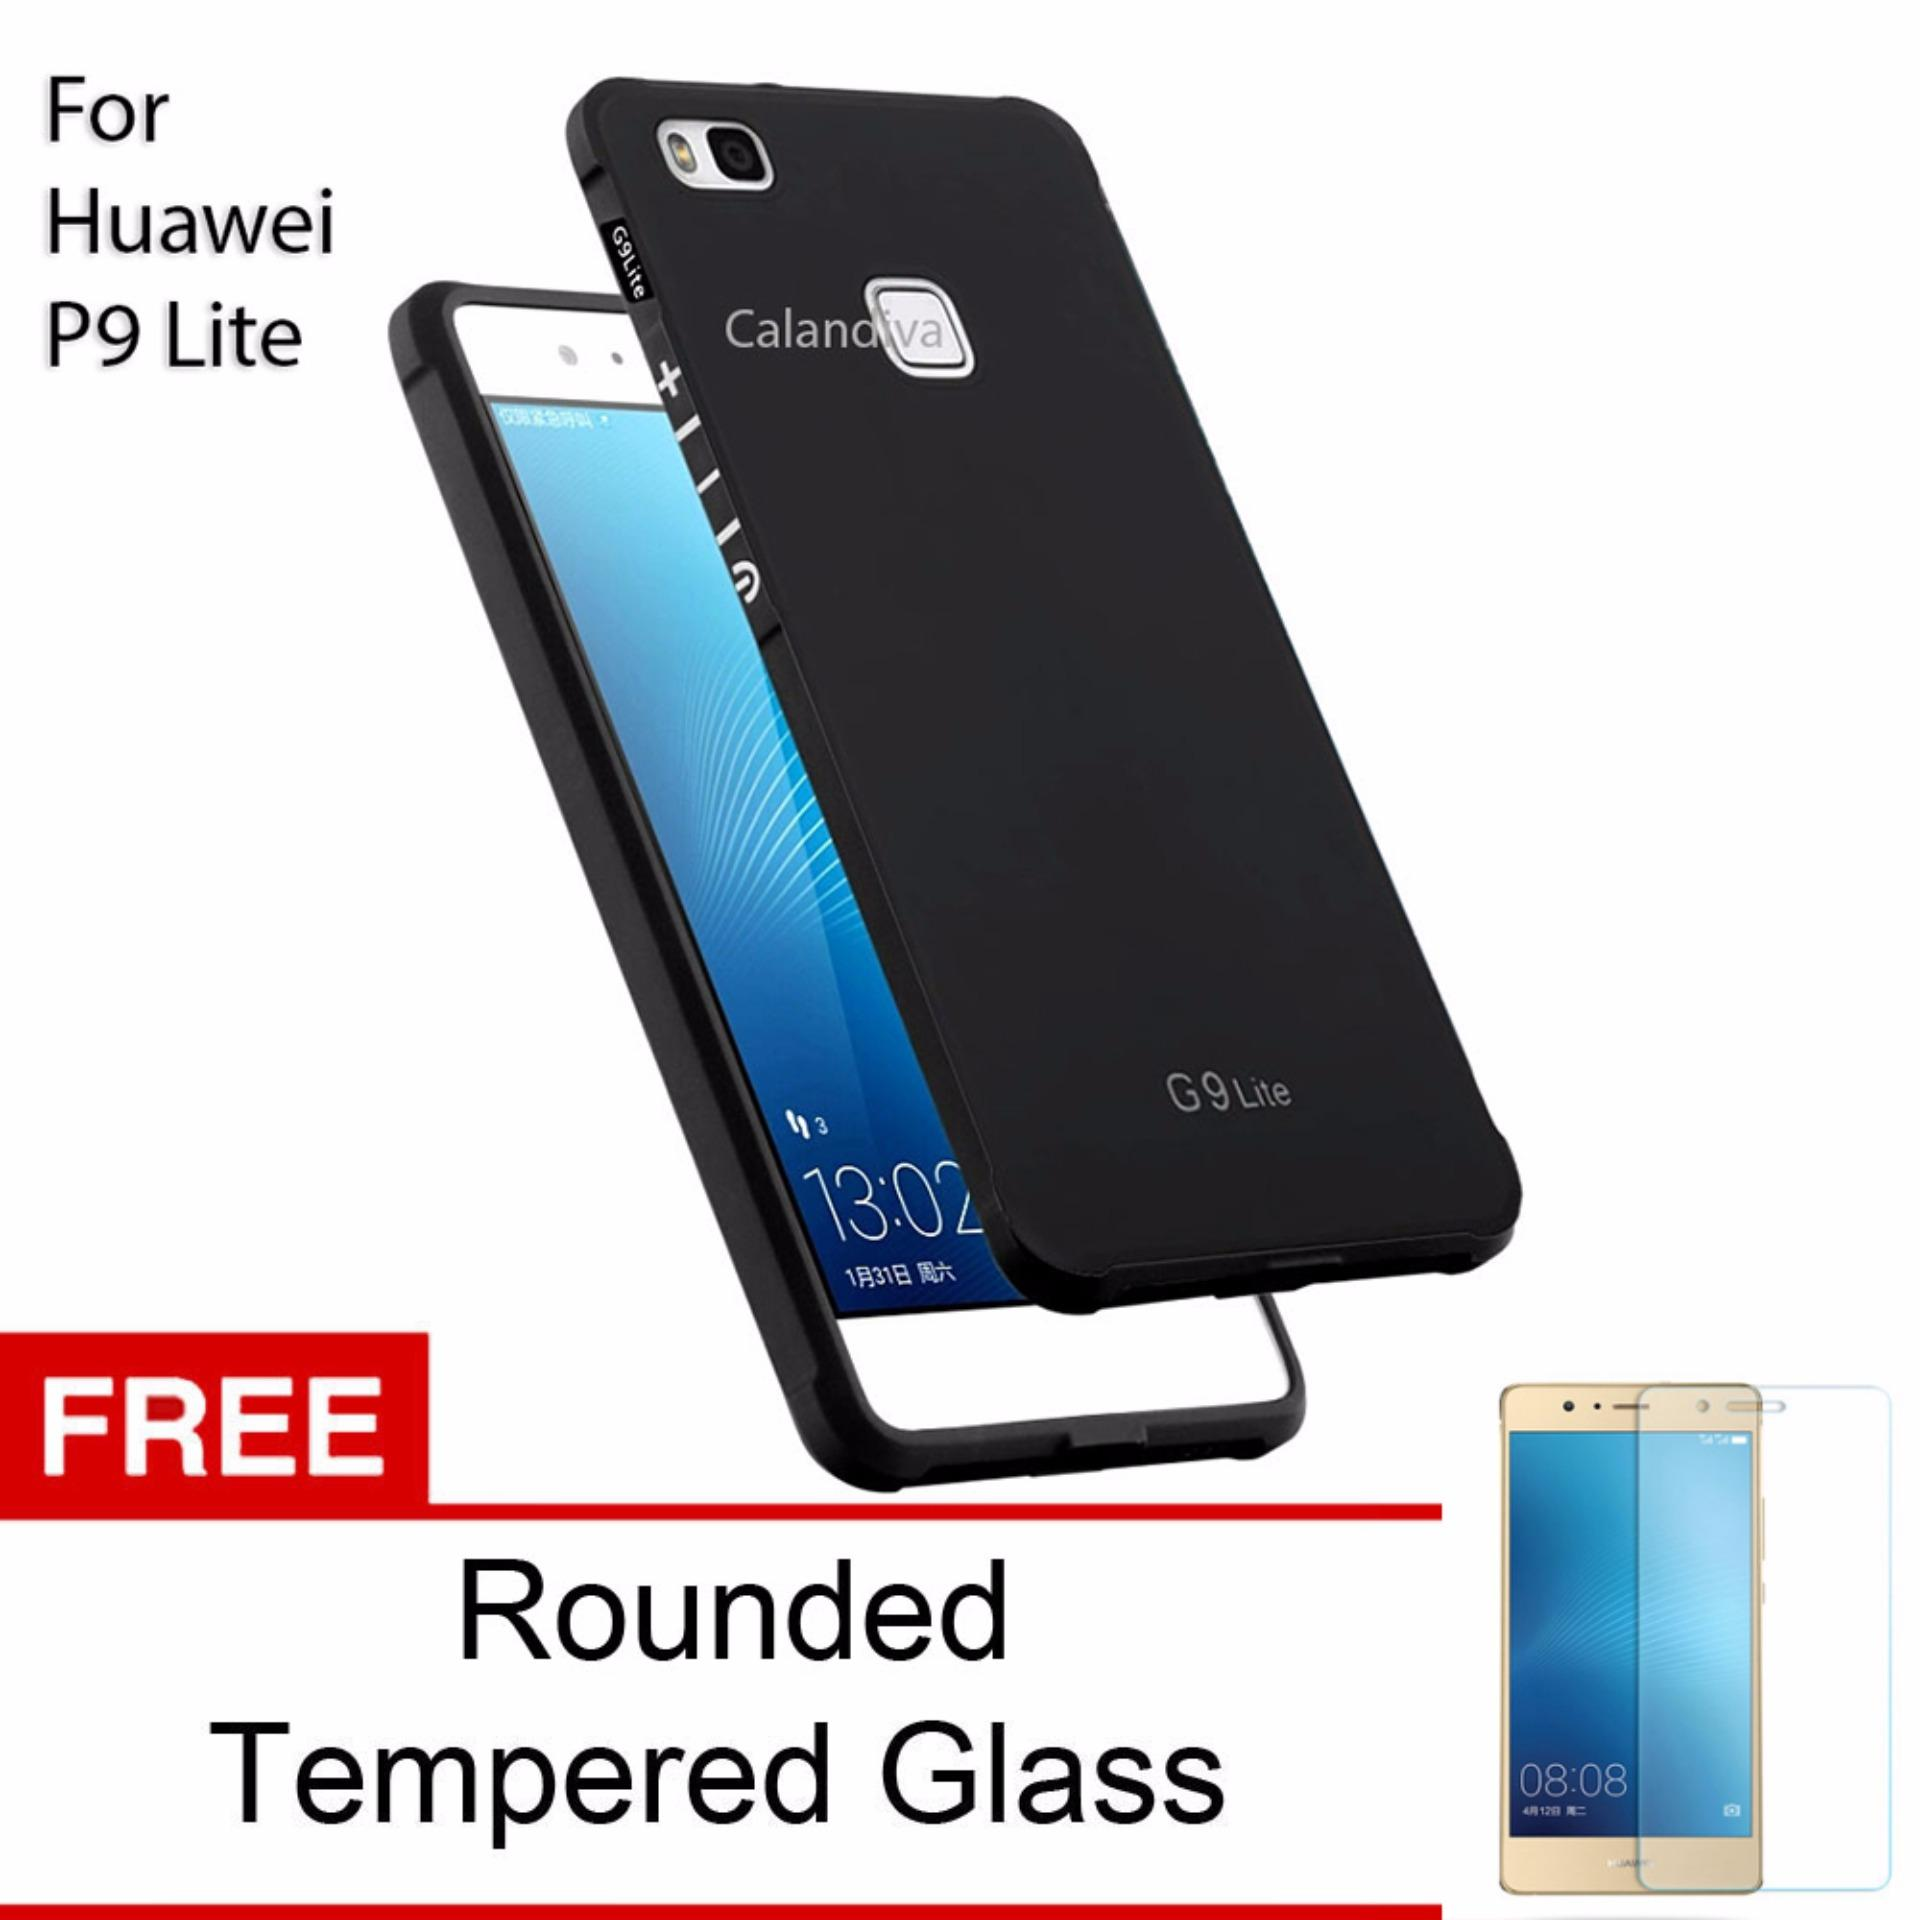 Beli Calandiva Shockproof Hybrid Premium Quality Grade A Softcase For Huawei P9 Lite G9 Lite Hitam Rounded Tempered Glass Di Jawa Barat